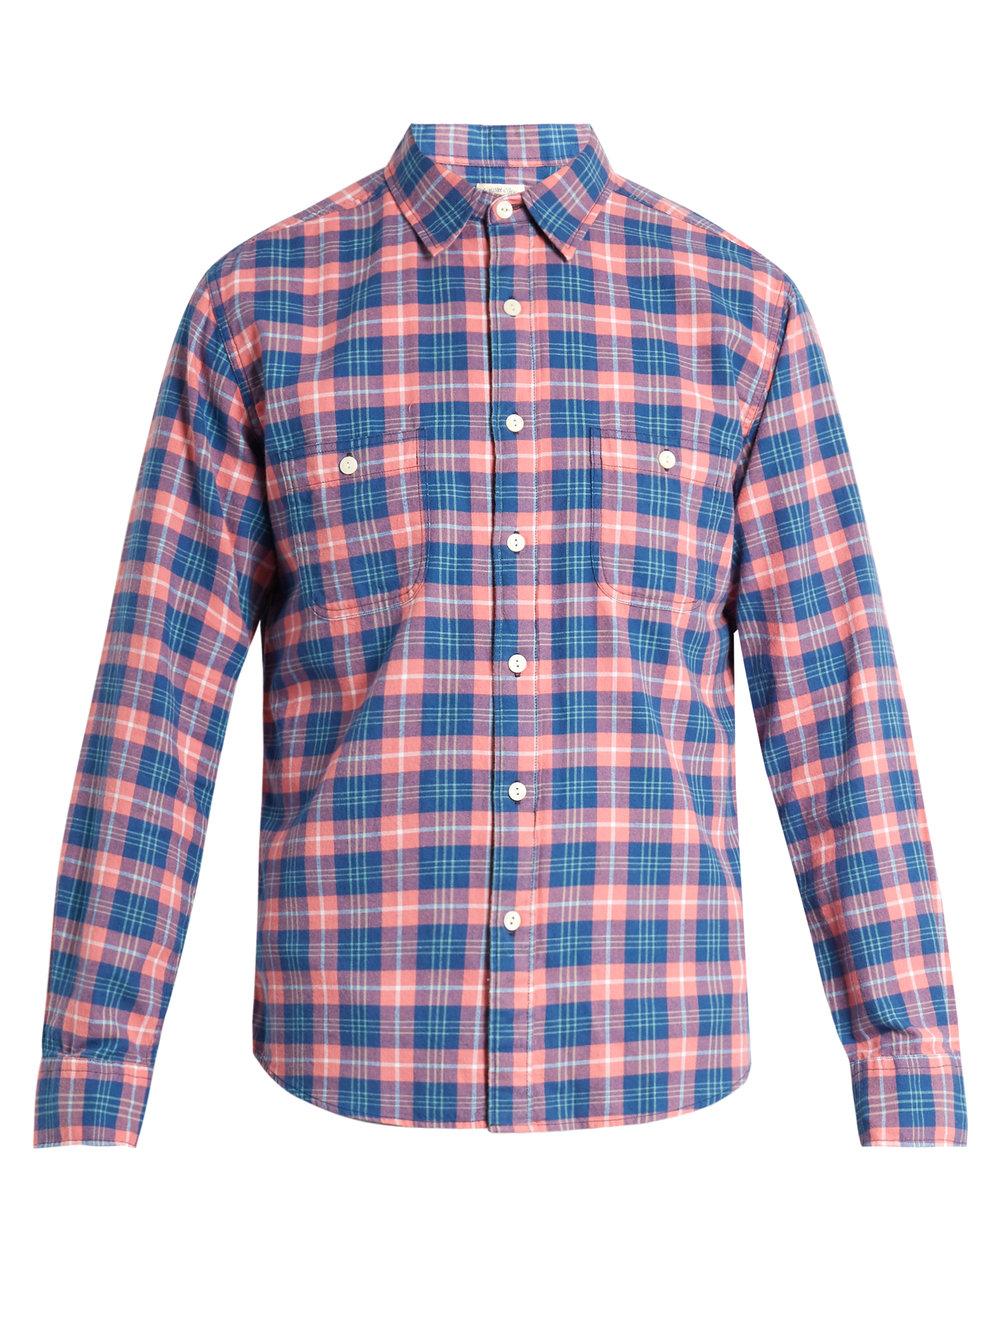 10. Faherty shirt at MATCHESFASHION.COM.Jpeg